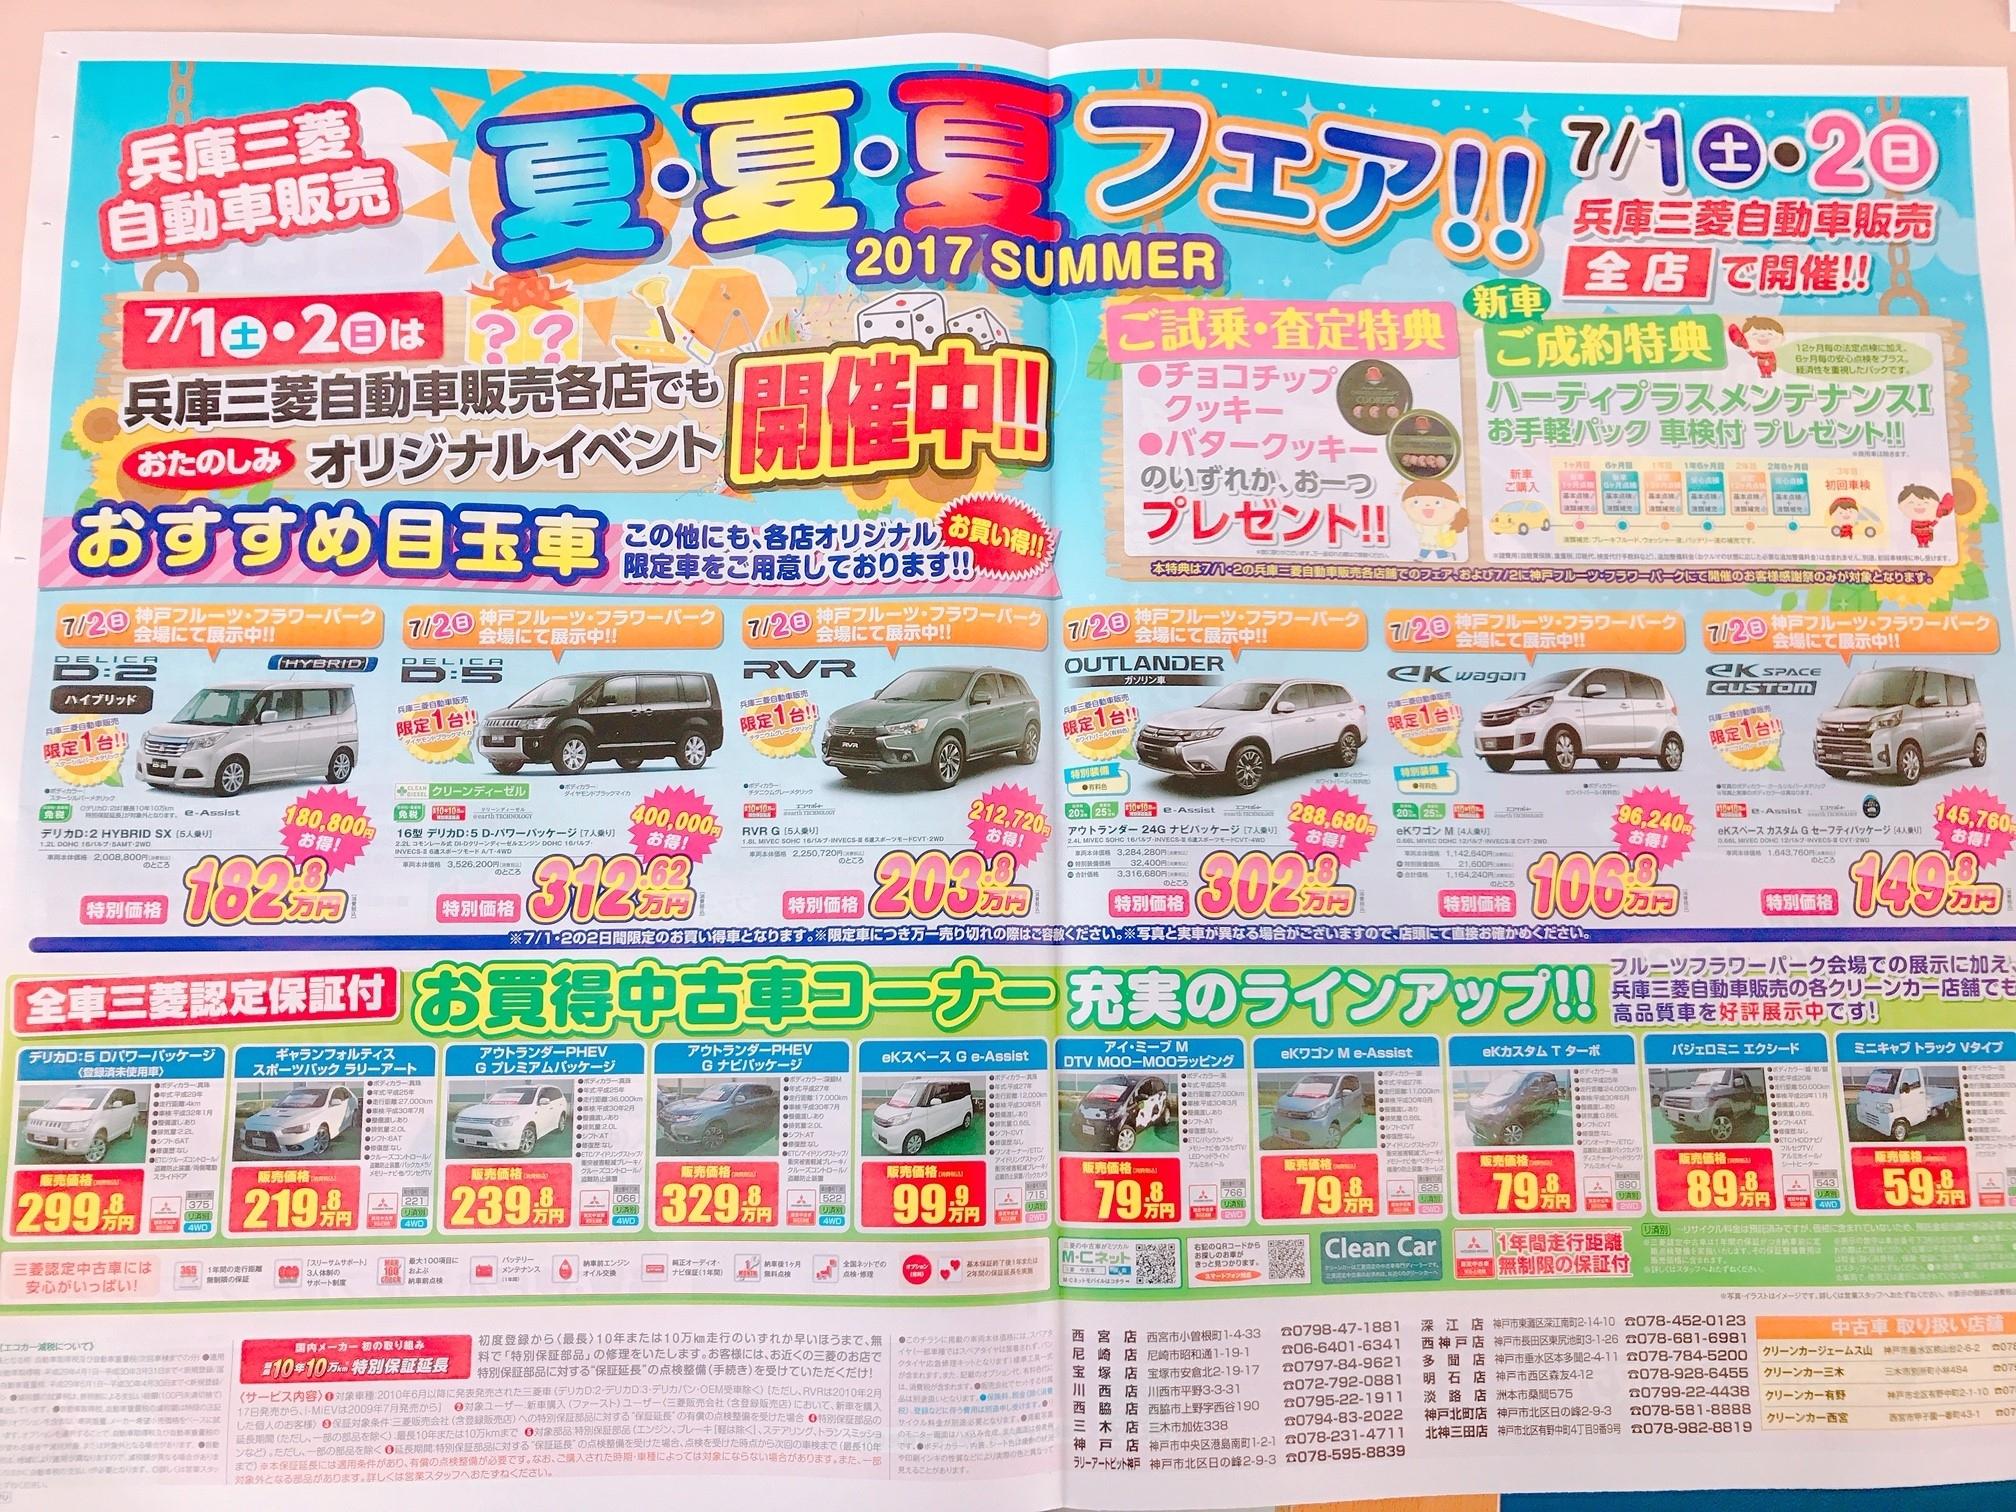 https://www.hyogo-mitsubishi.com/shop/takarazuka/files/805b5cb4a73c5b8ddbd8b0831b5a62b80fb8115b.JPG